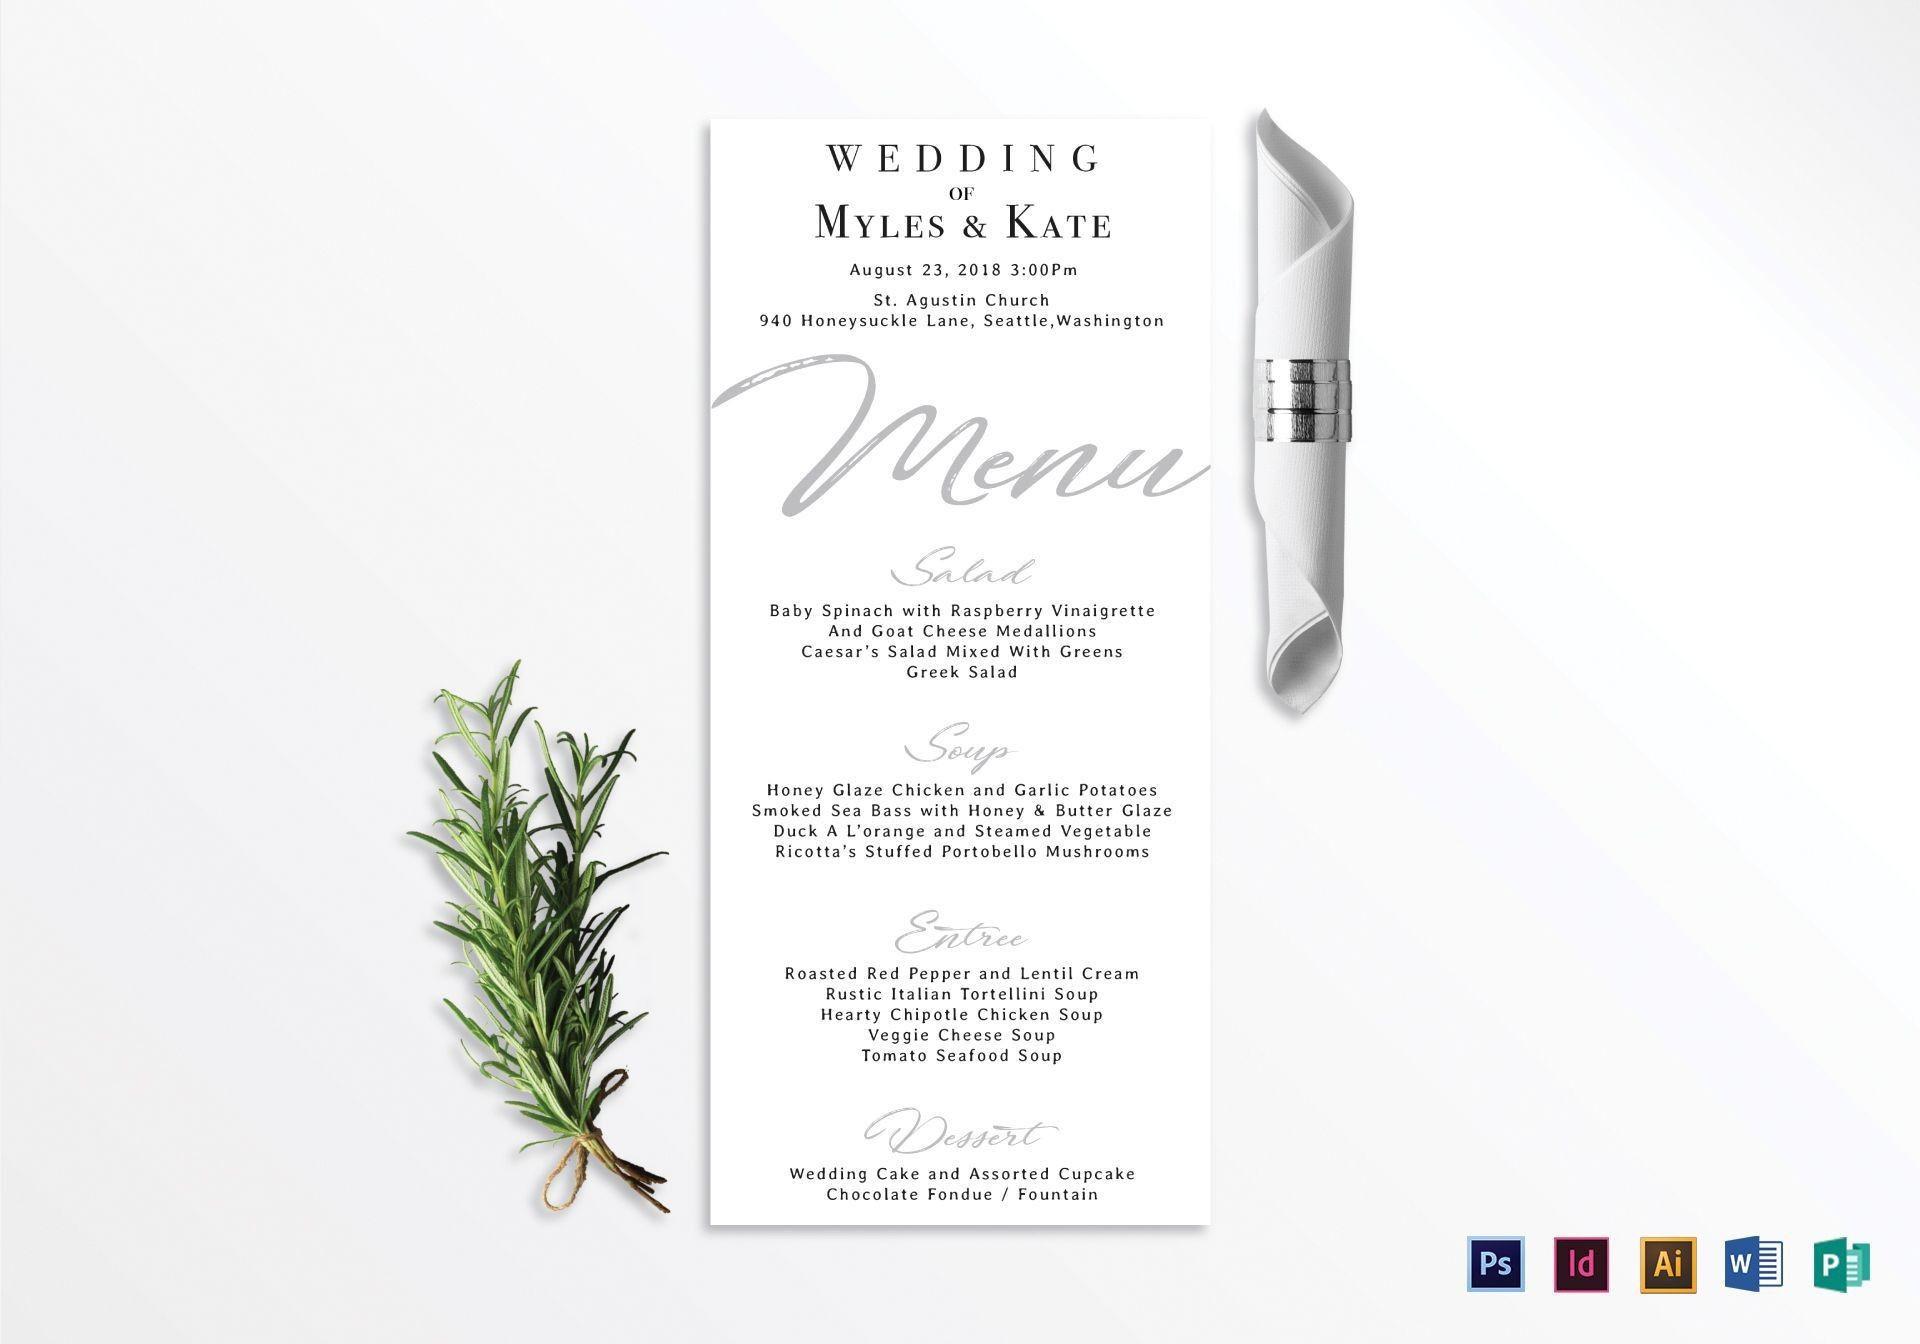 002 Incredible Wedding Menu Card Template Word Example 1920